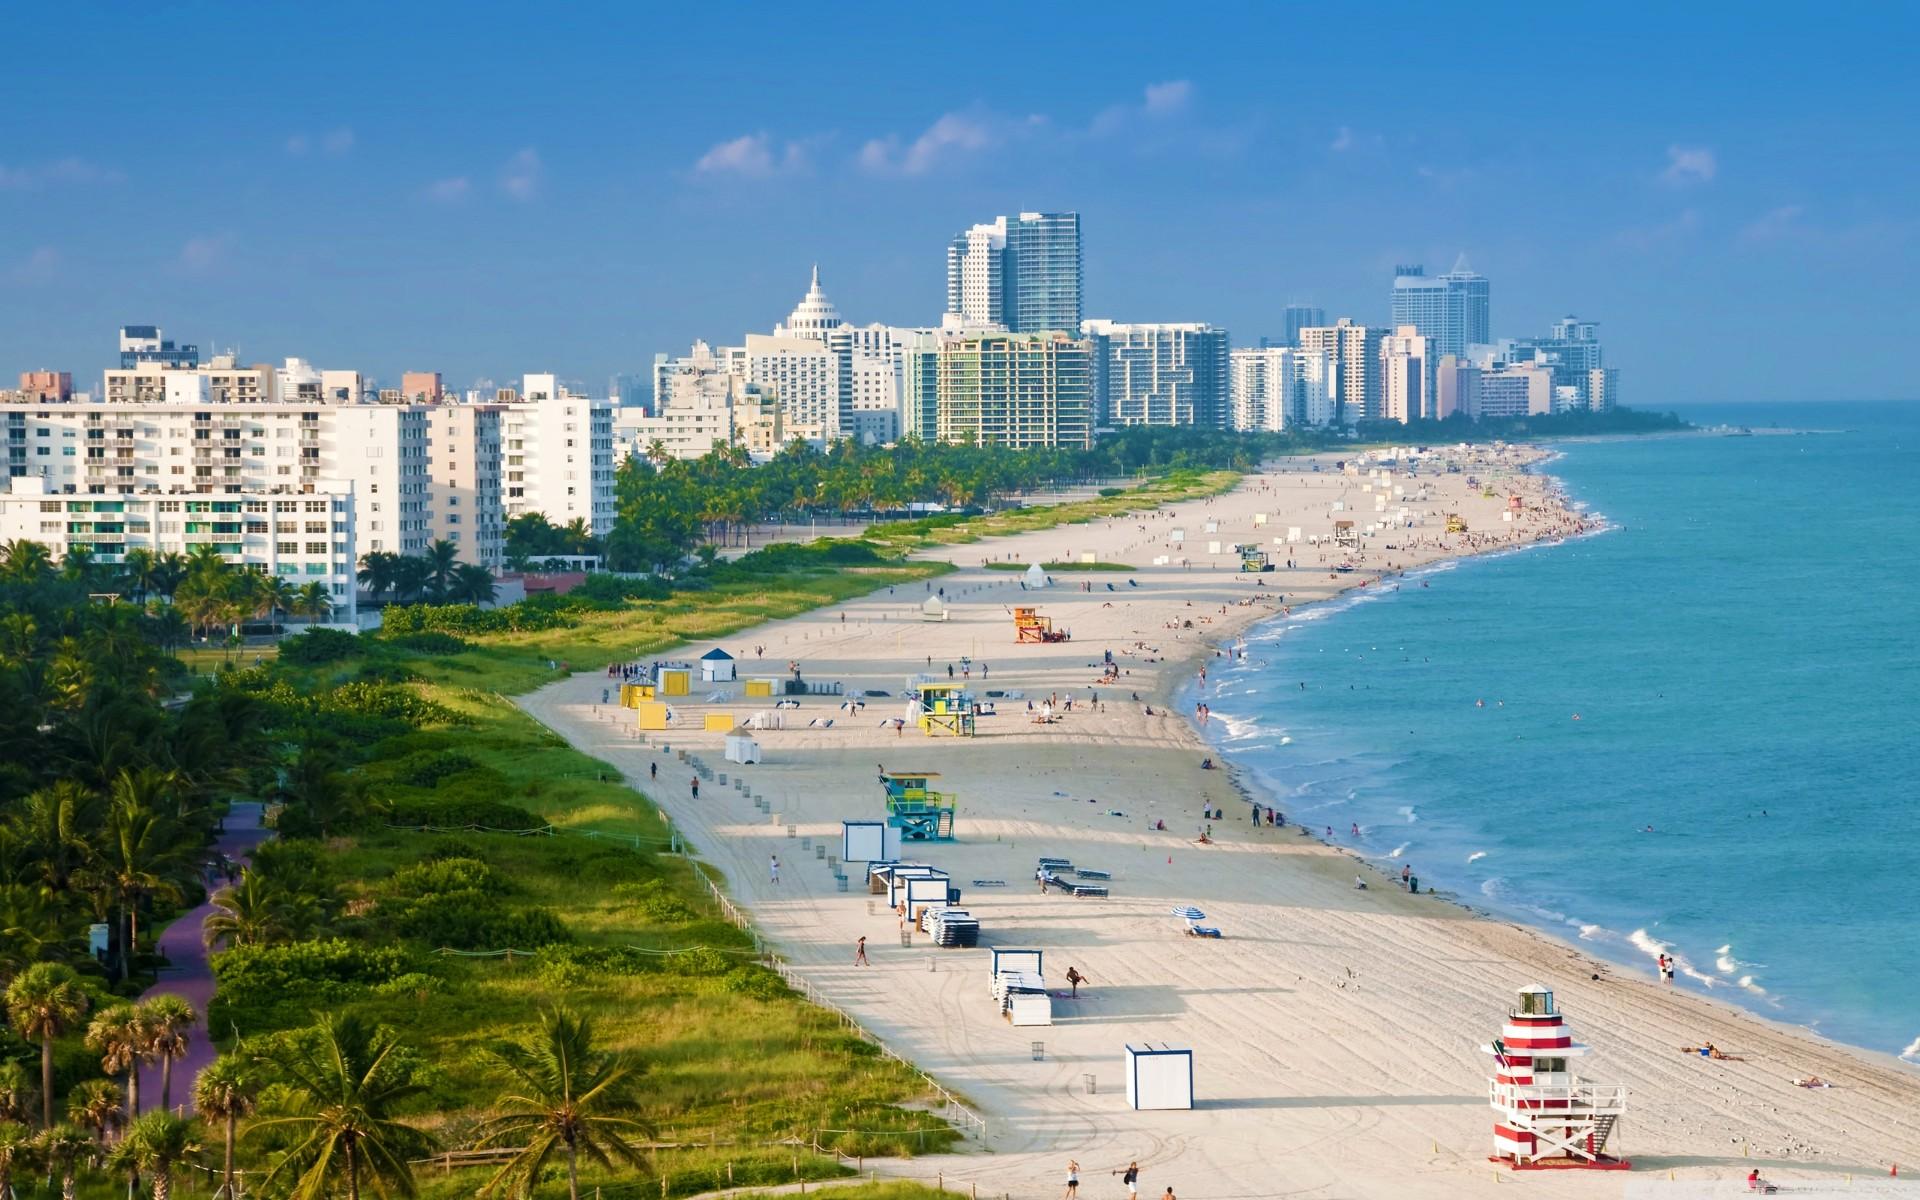 north-miami-beach-florida.jpg